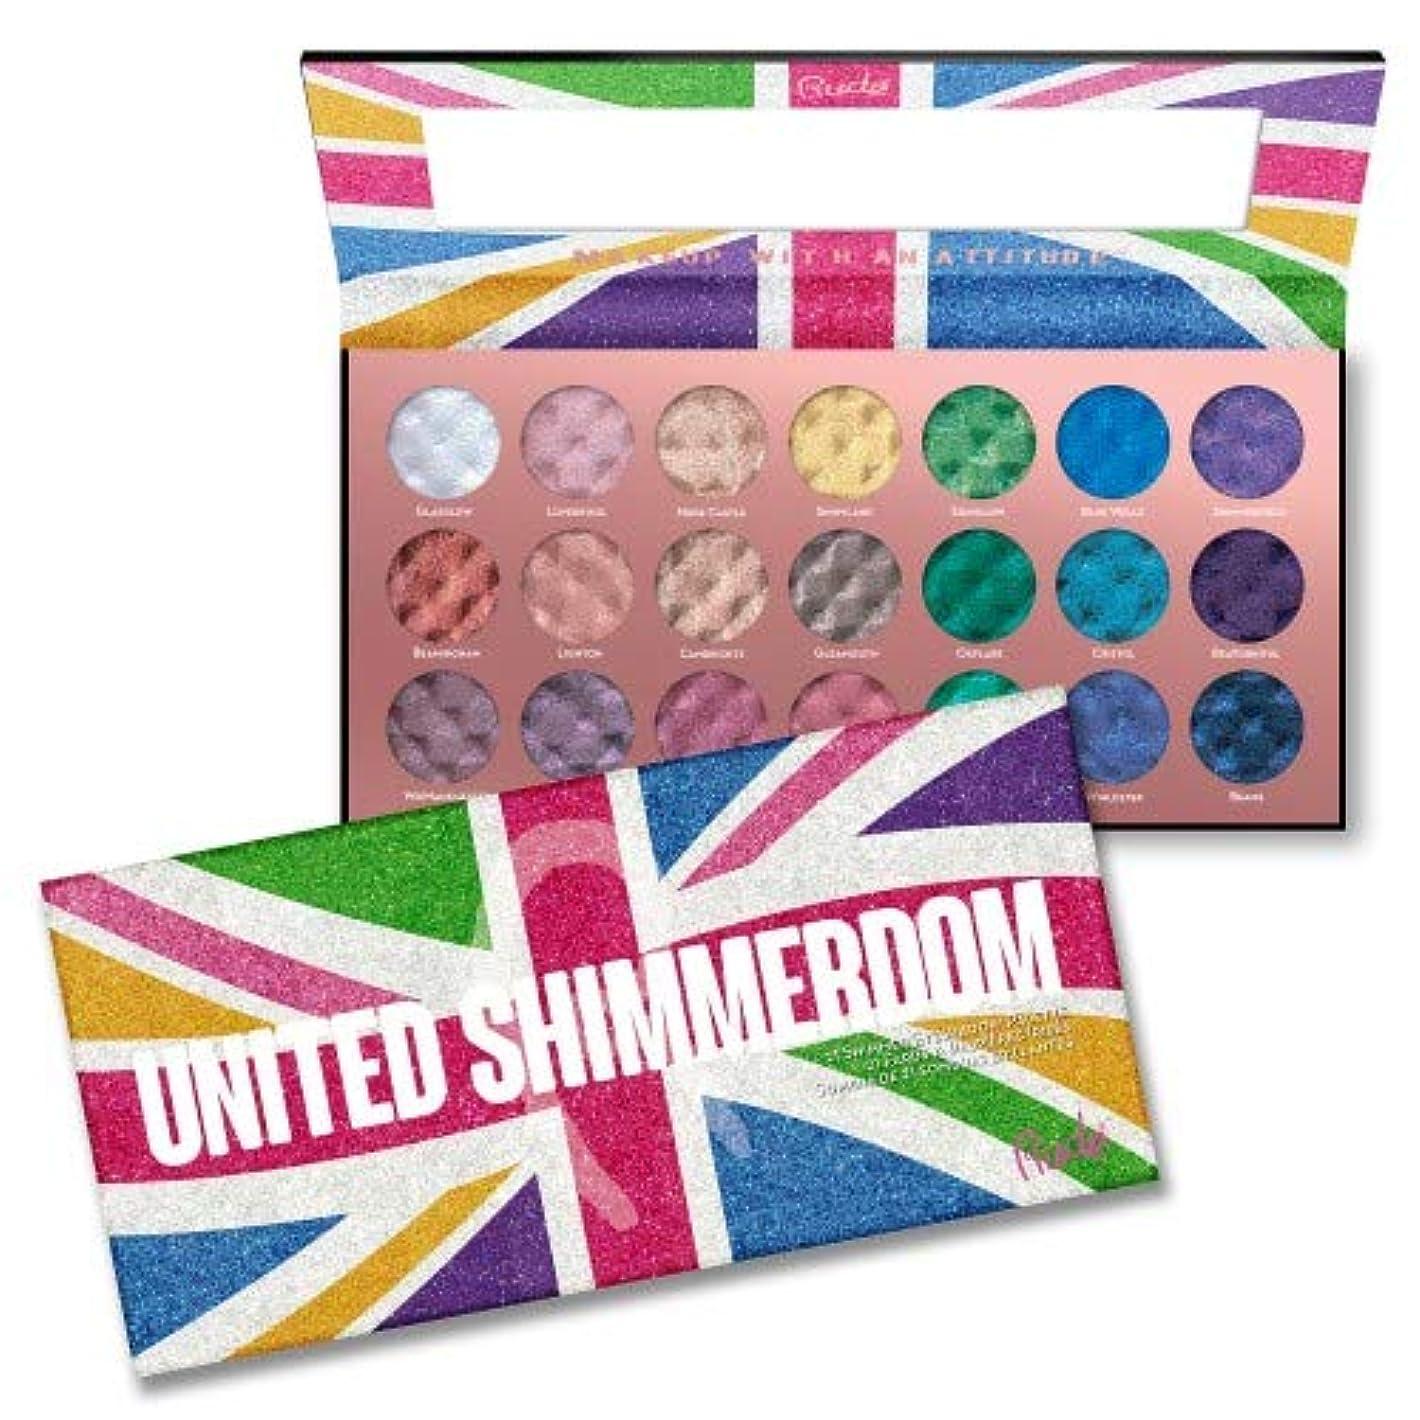 (3 Pack) RUDE United Shimmerdom - 21 Shimmer Eyeshadow Palette (並行輸入品)